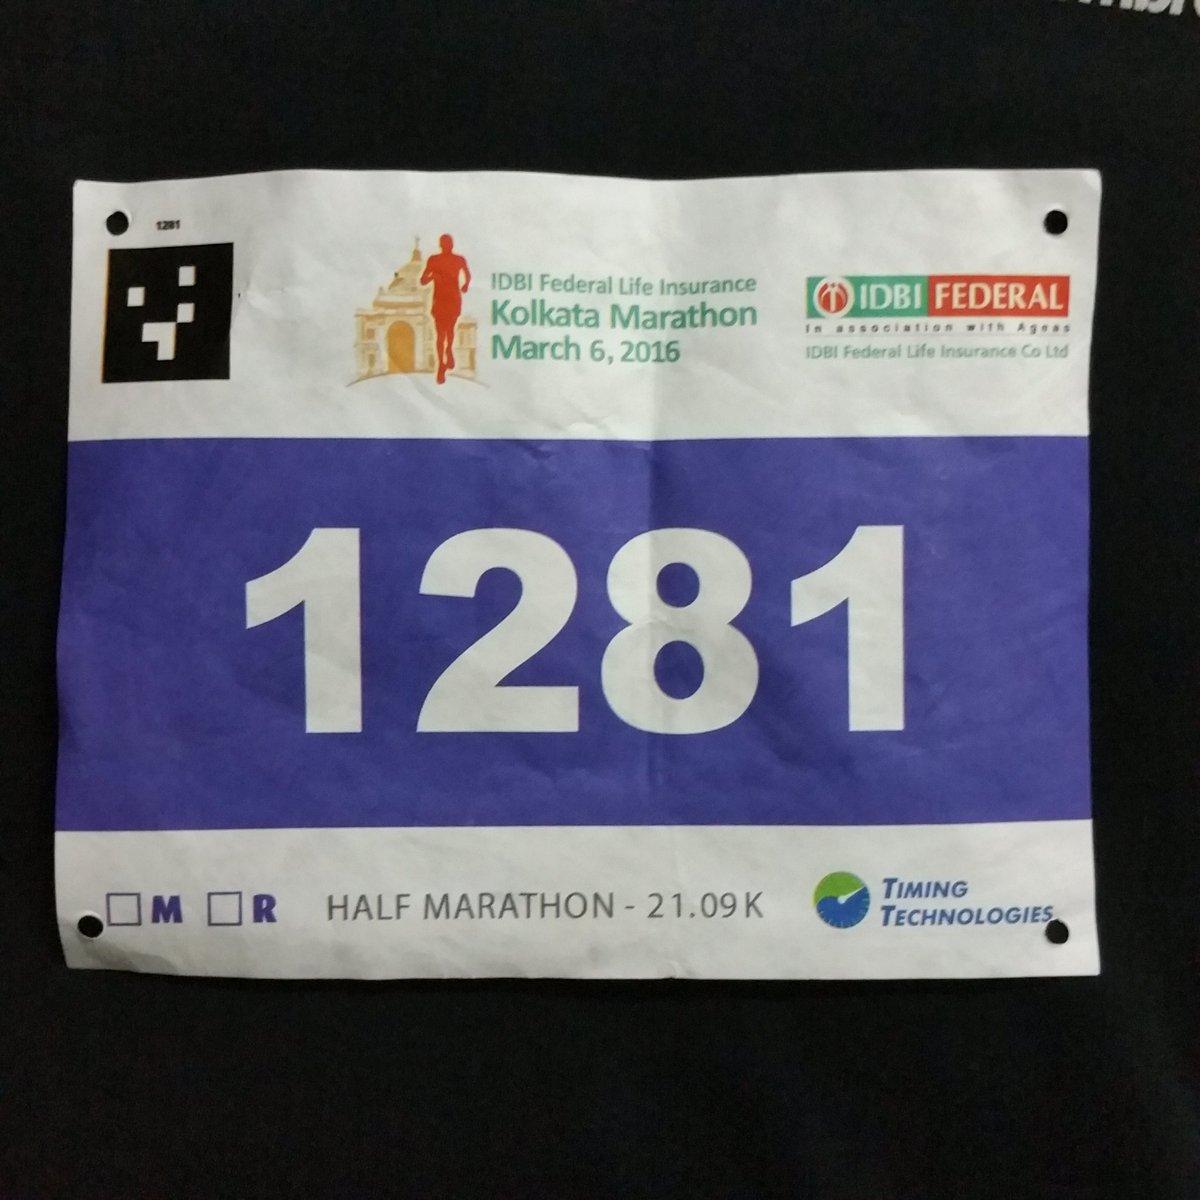 All set for the Kolkata Marathon tomorrow. Running the 21k. So excited to #runforkolkata :)) https://t.co/aLWkeOfczI